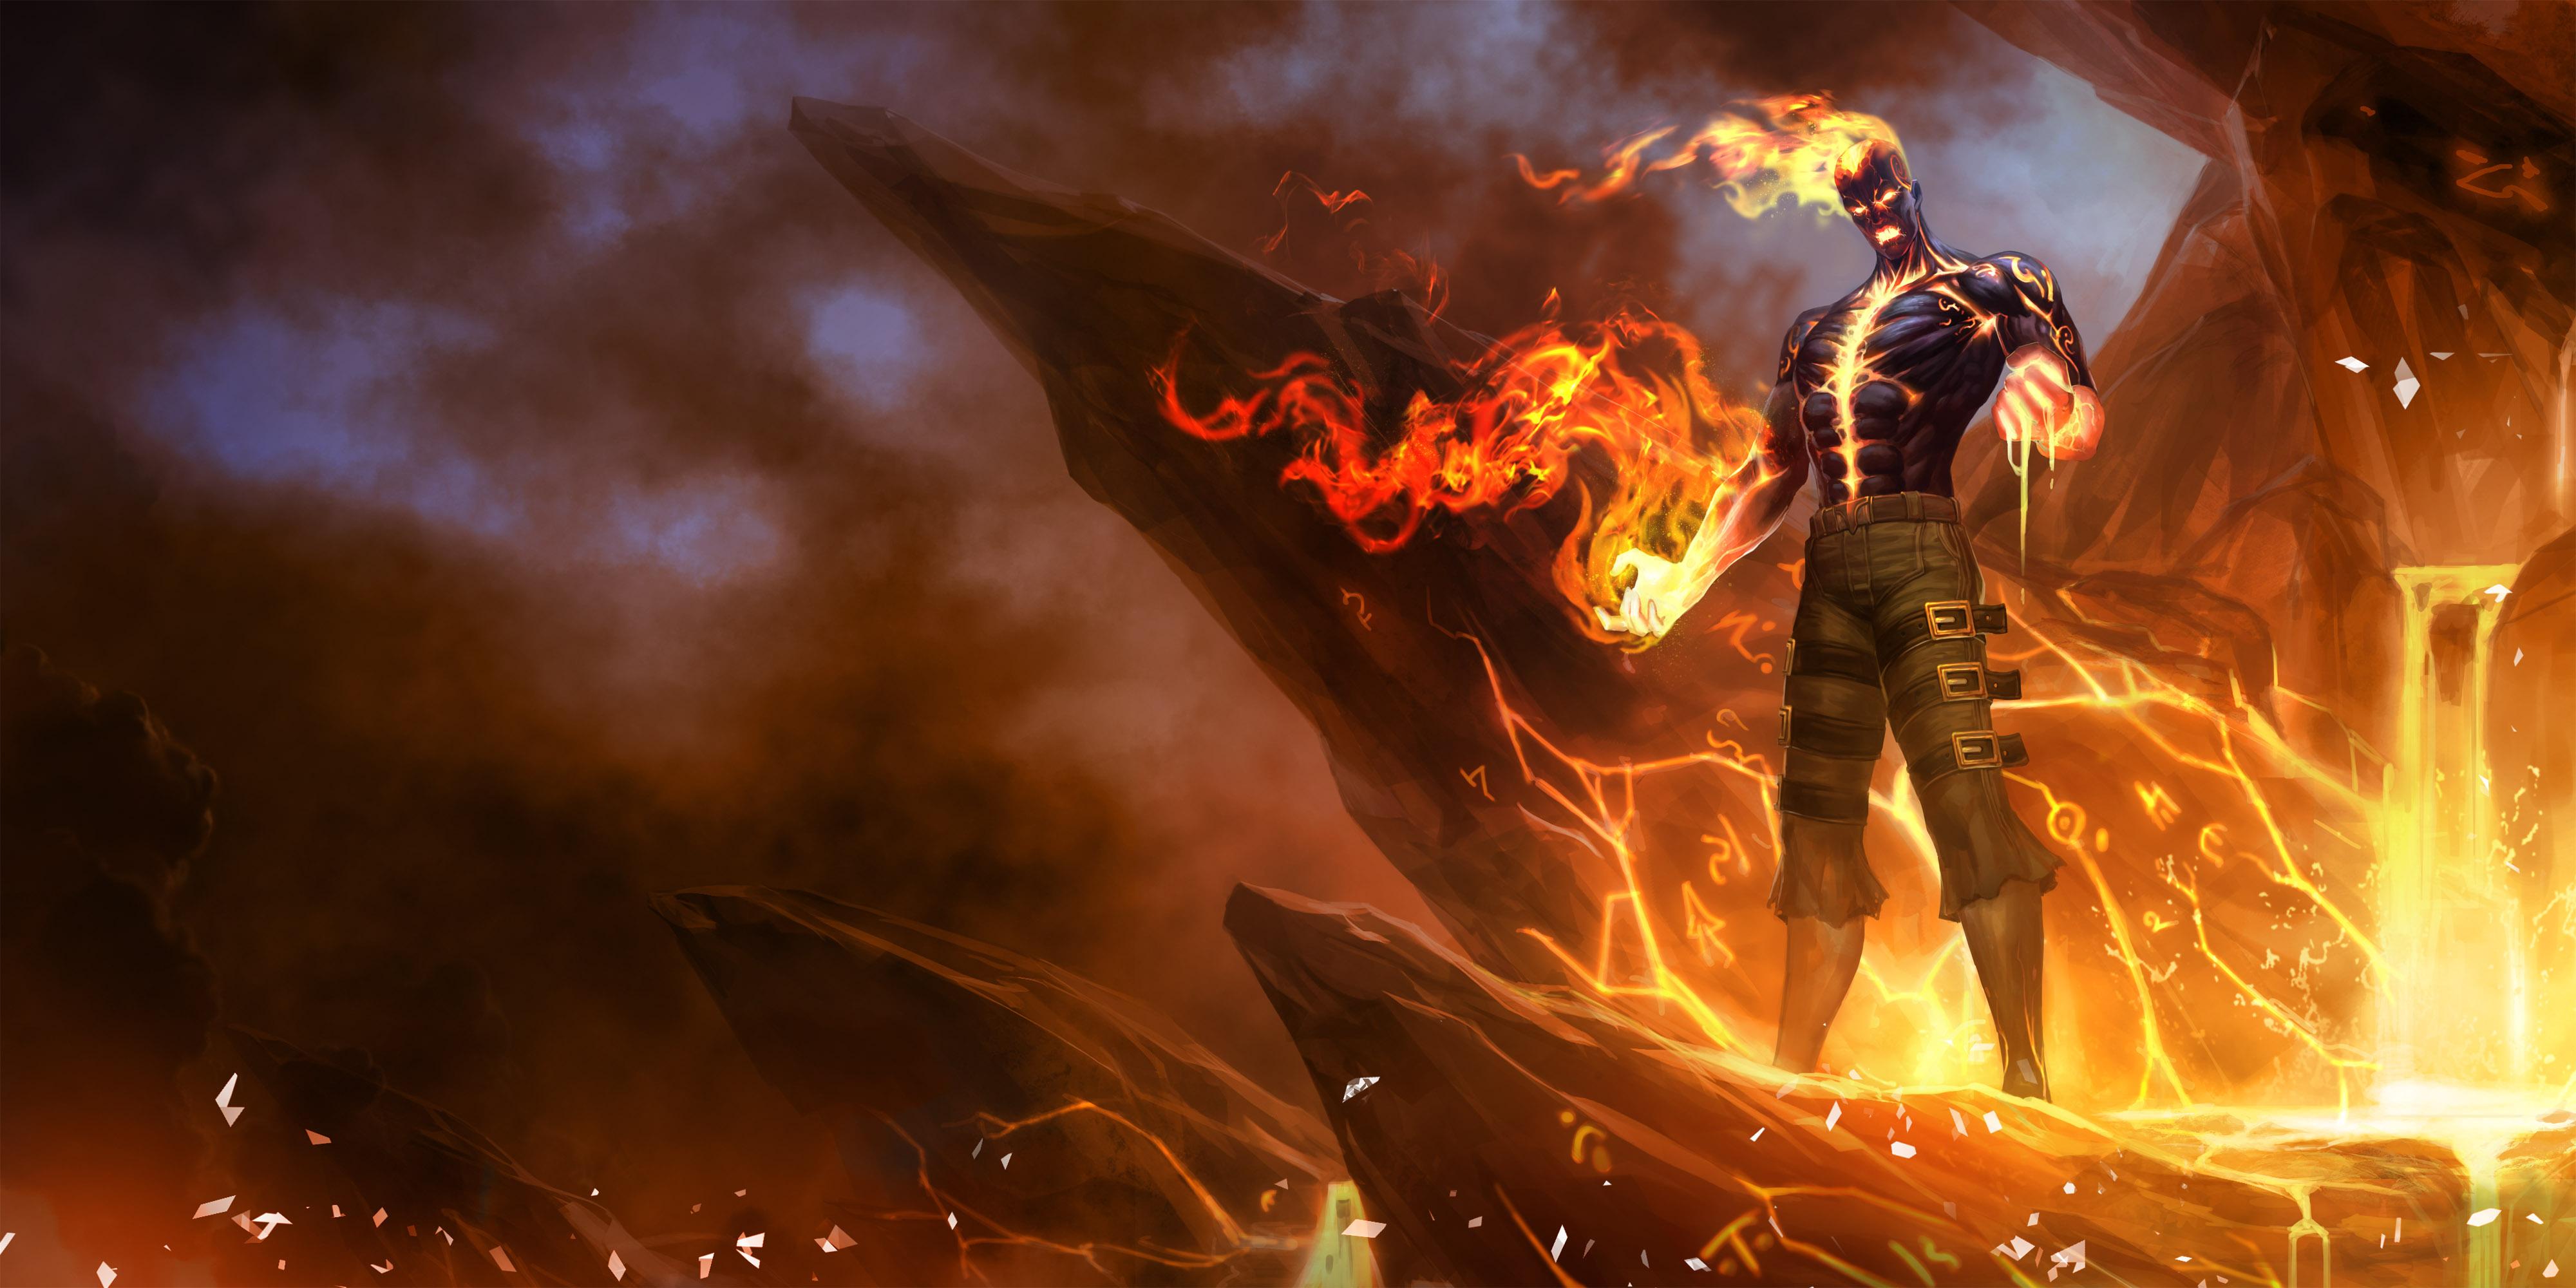 League Of Legends 4k Wallpaper: Brand League Of Legends 4k, HD Games, 4k Wallpapers